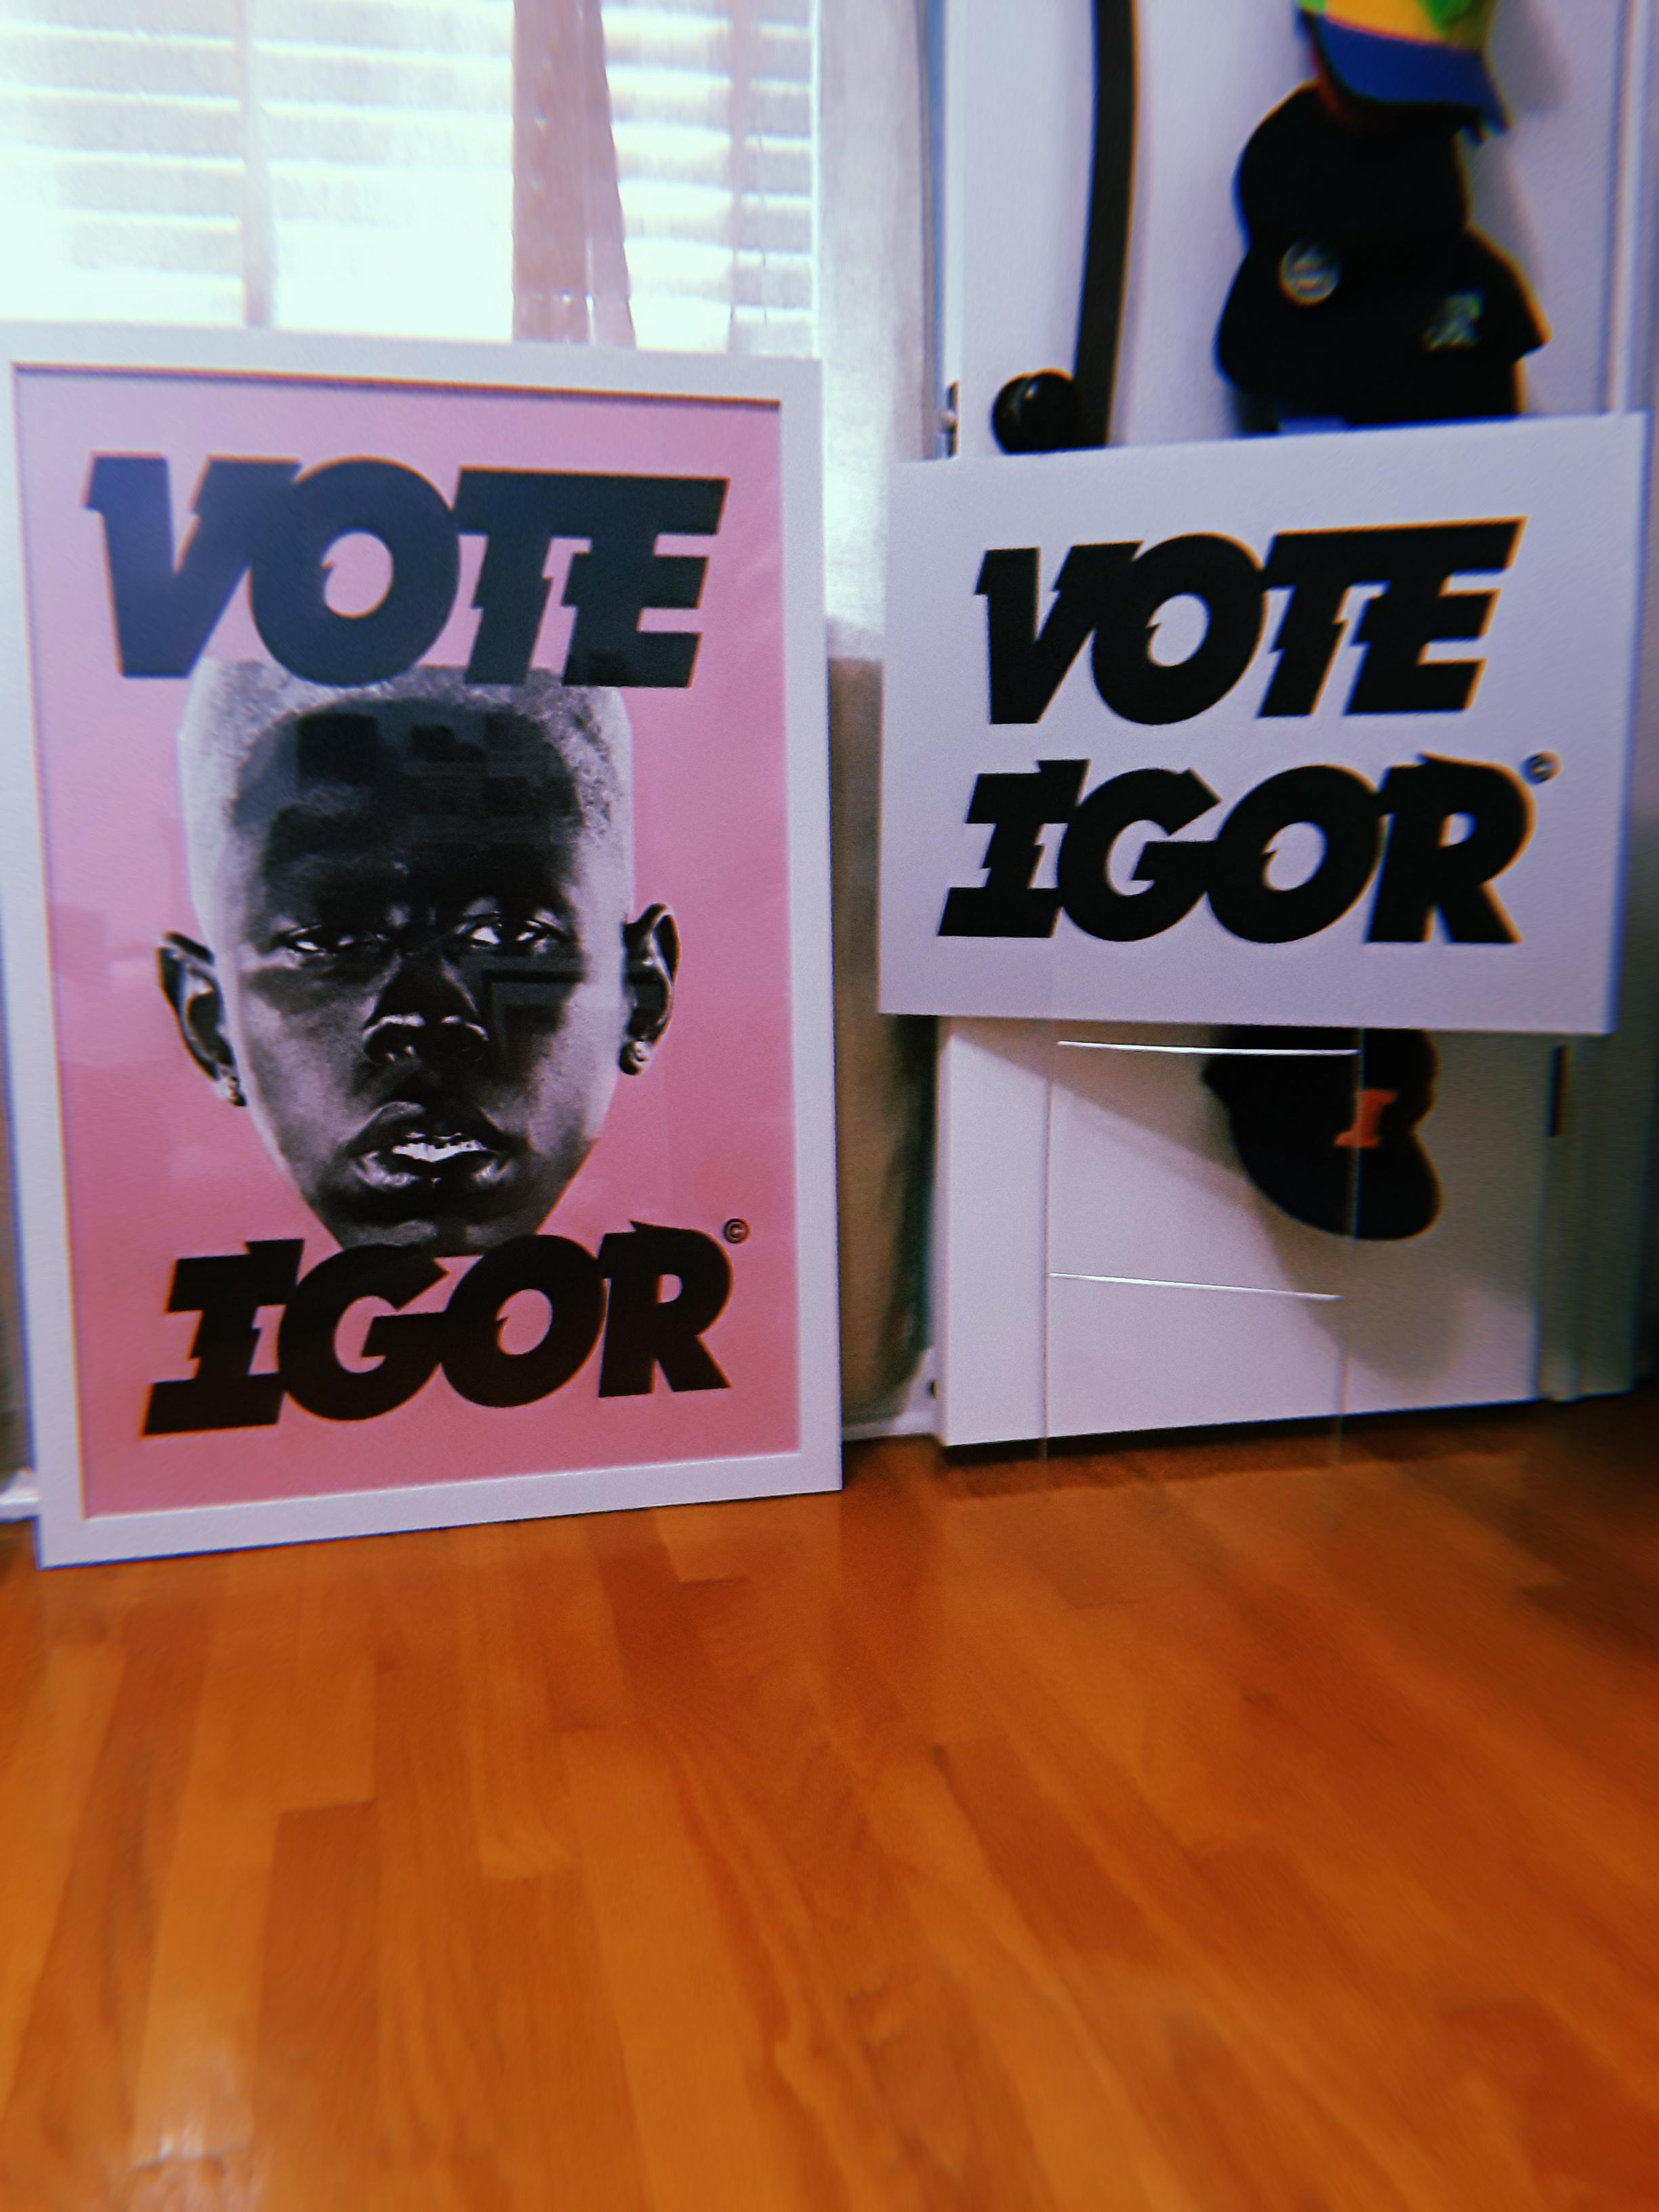 finally framed my vote igor poster